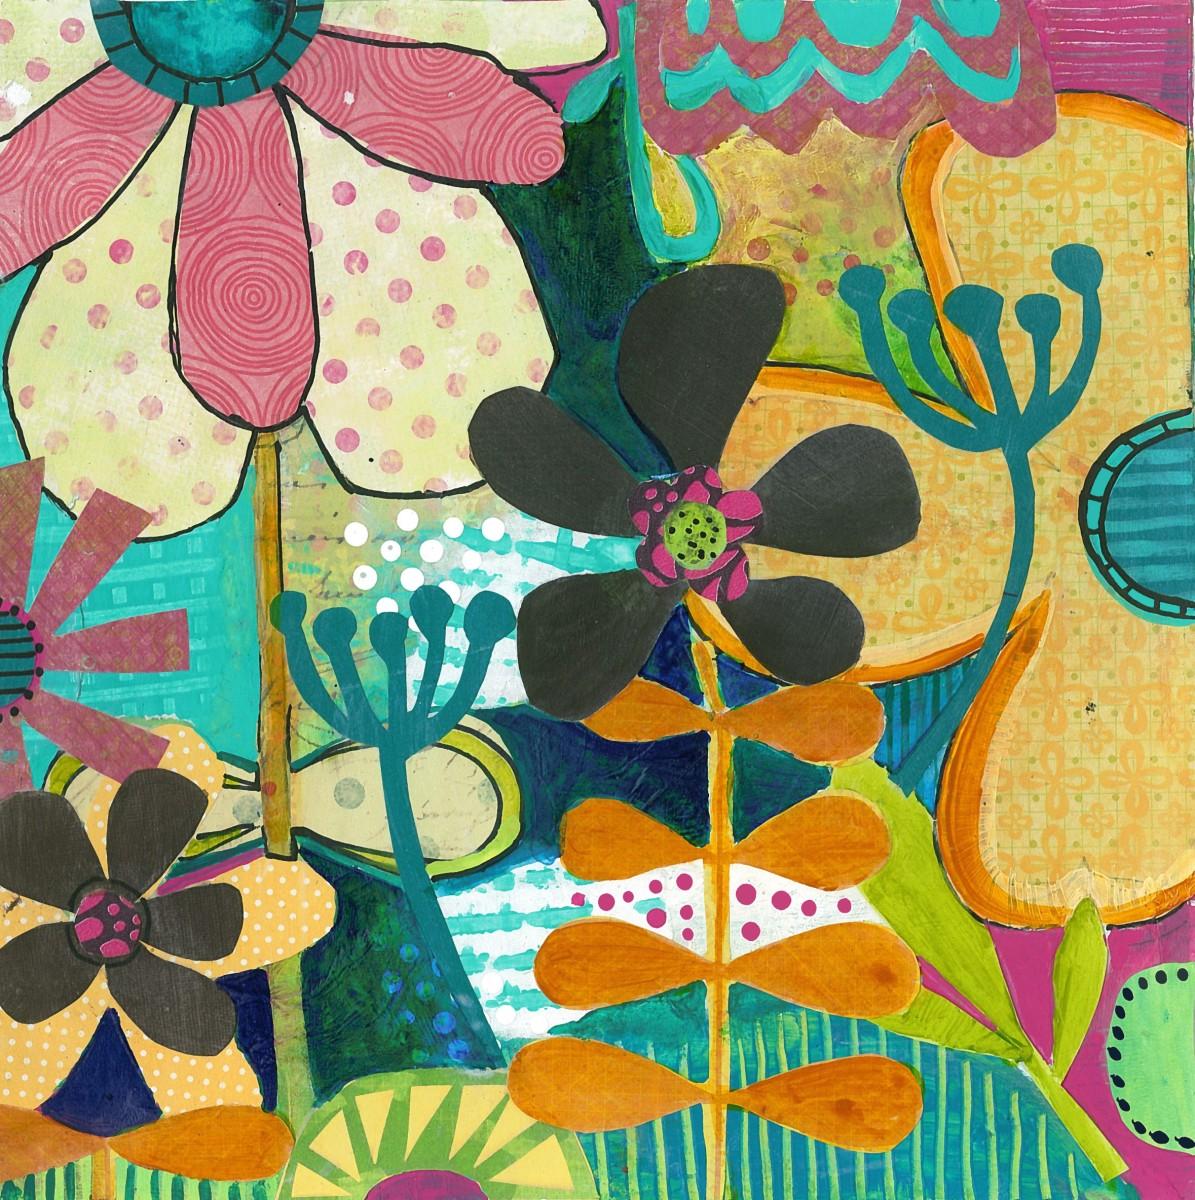 Tangled Weave Series - Julie Hamilton Designs {artistically afflicted blog}